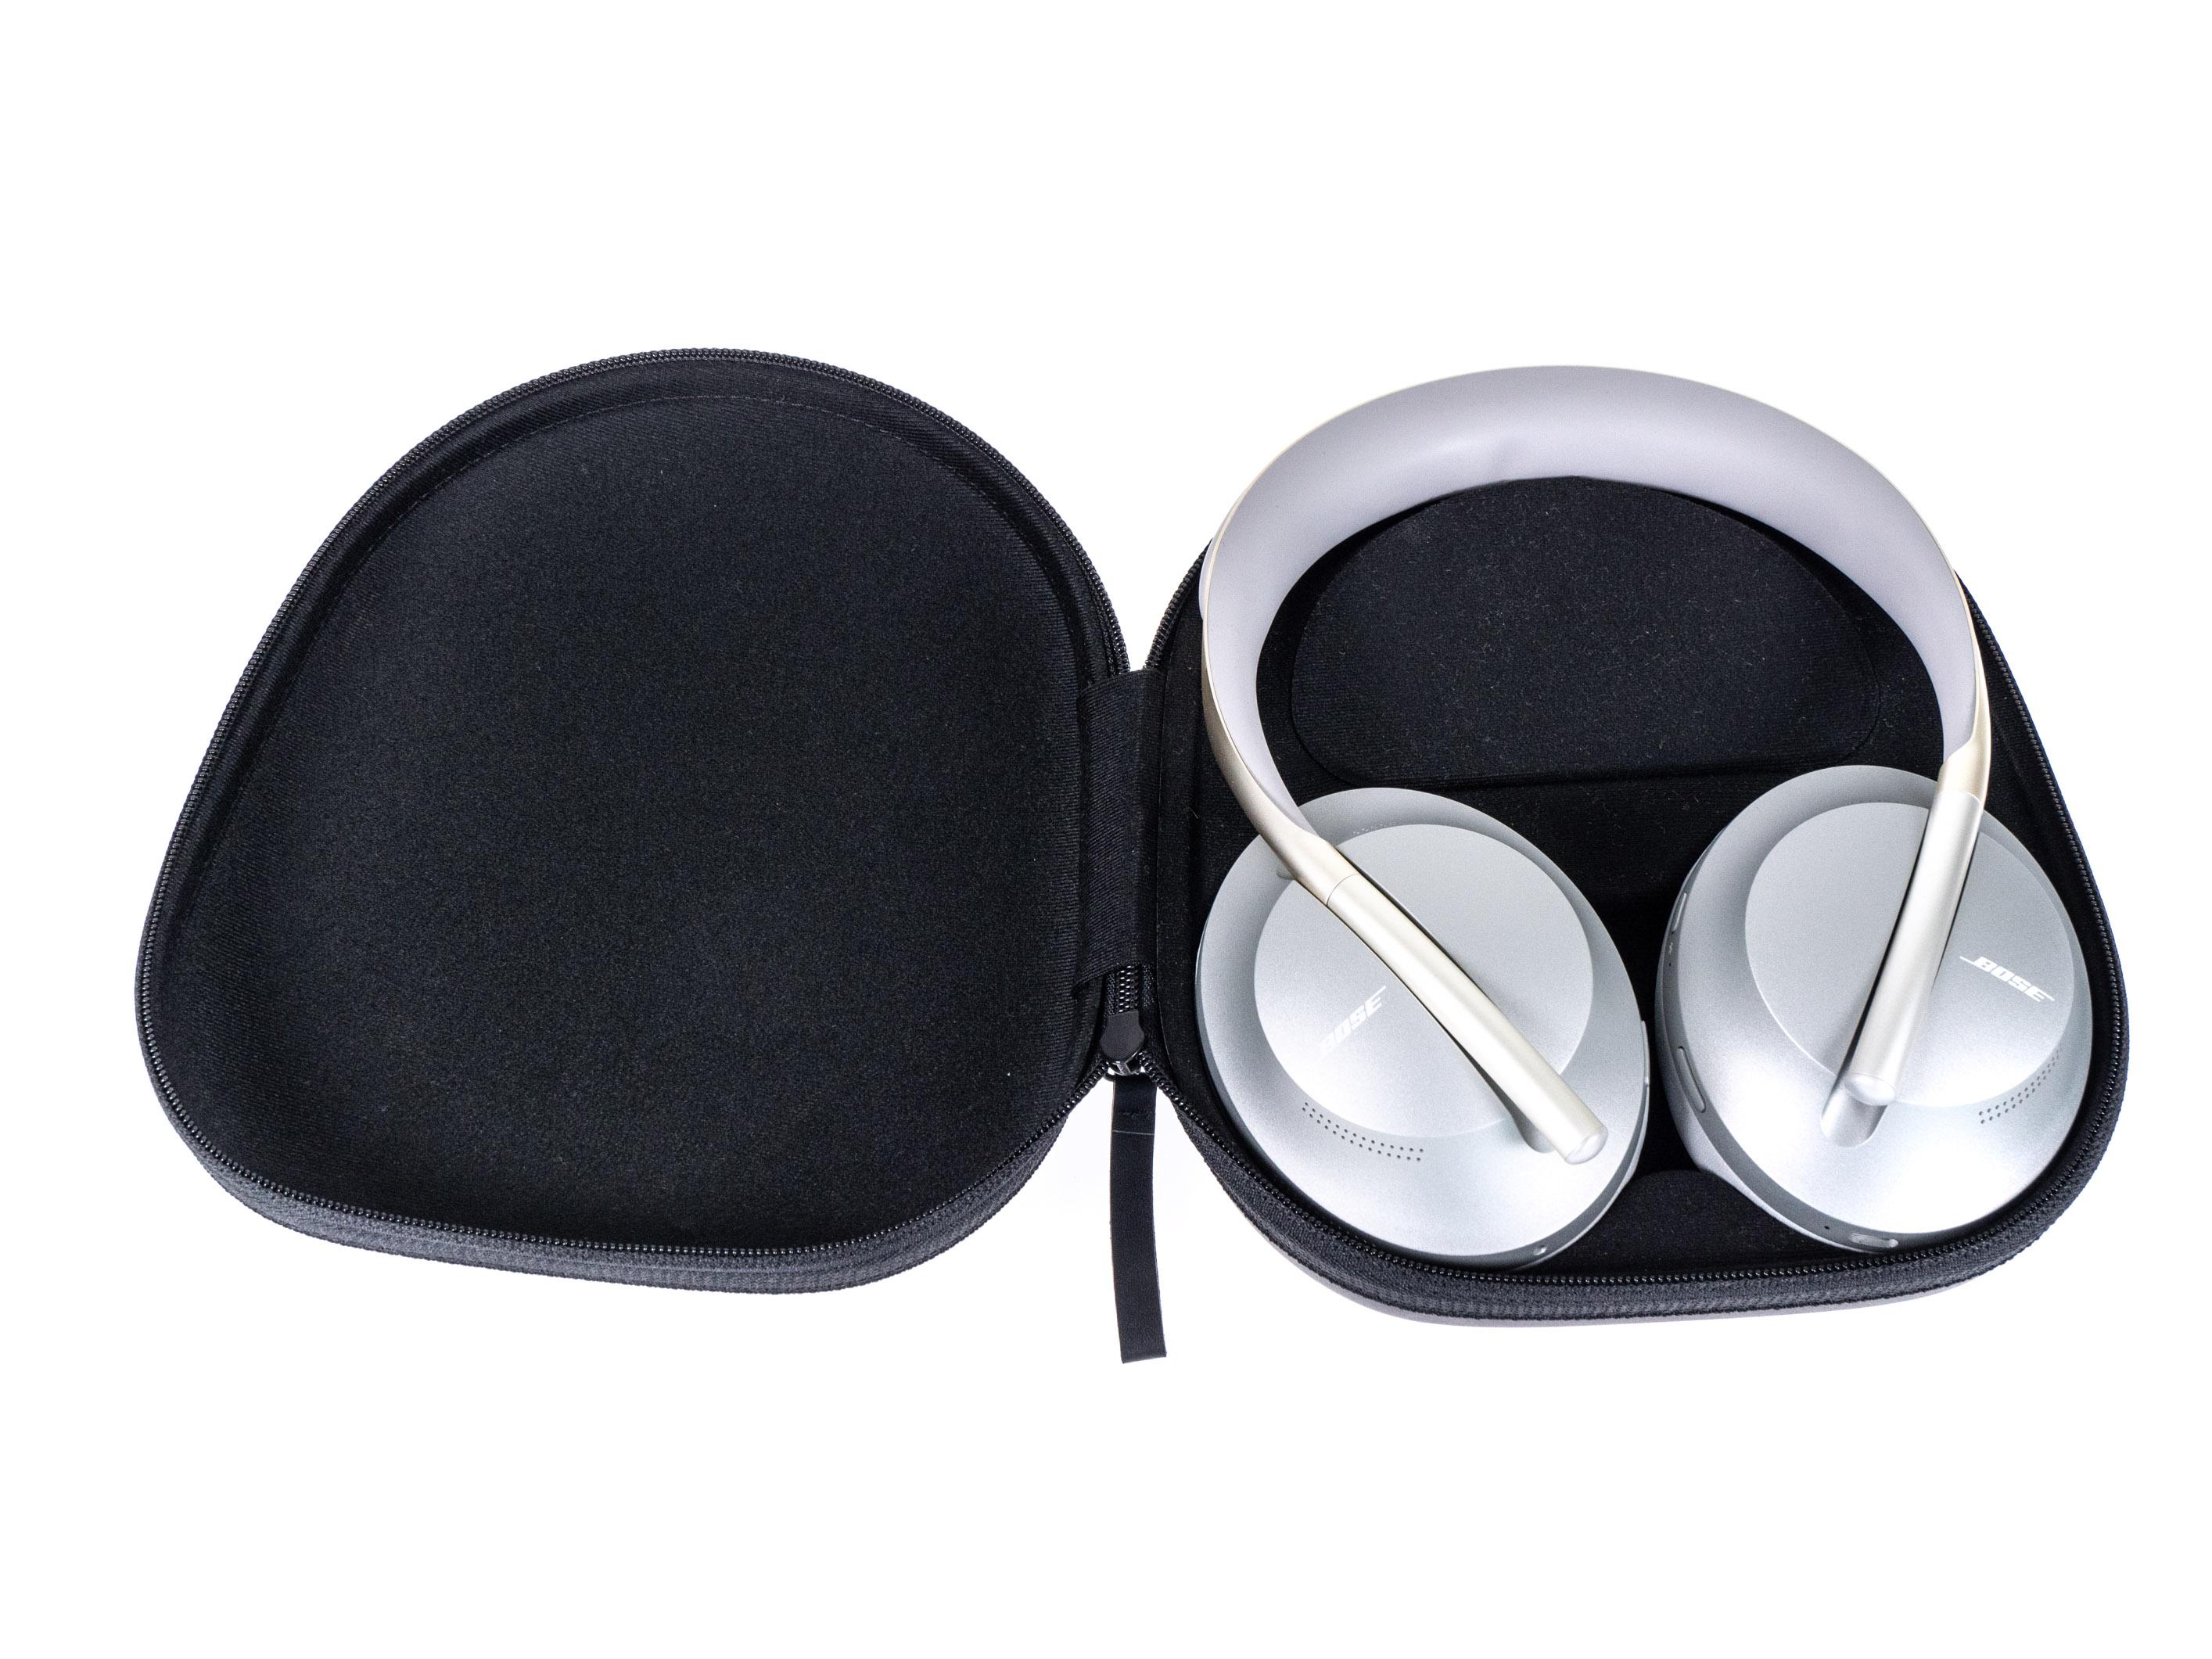 Noise Cancelling Headphones 700 im Test: Boses bester ANC-Kopfhörer sticht Sony vielfach aus - Boses Noise Cancelling Headphones 700 in der Transporttasche (Bild: Martin Wolf/Golem.de)